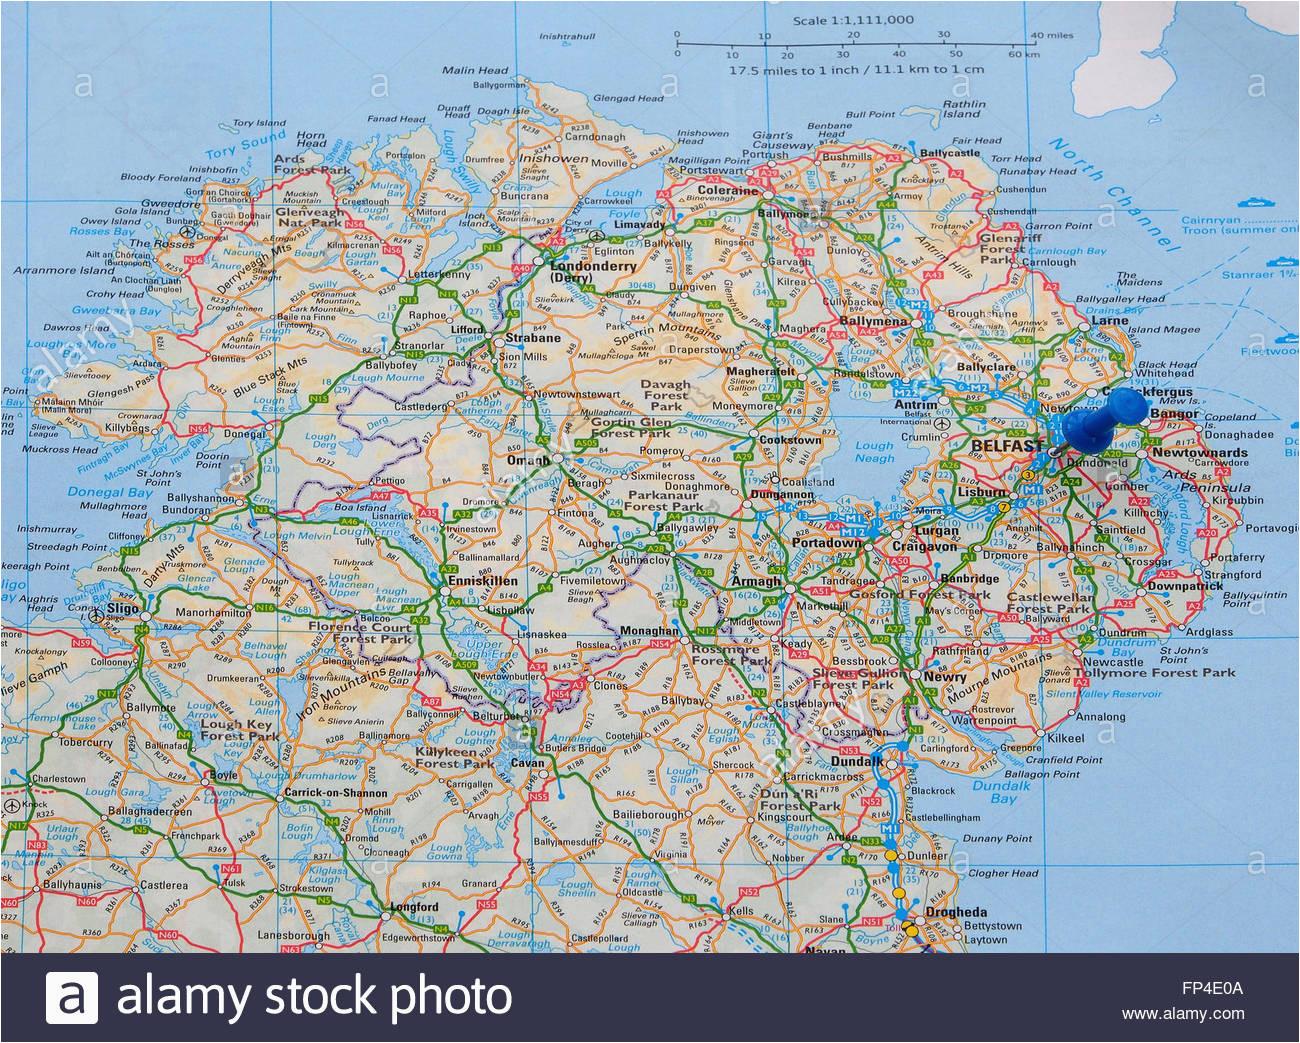 ireland map stock photos ireland map stock images alamy